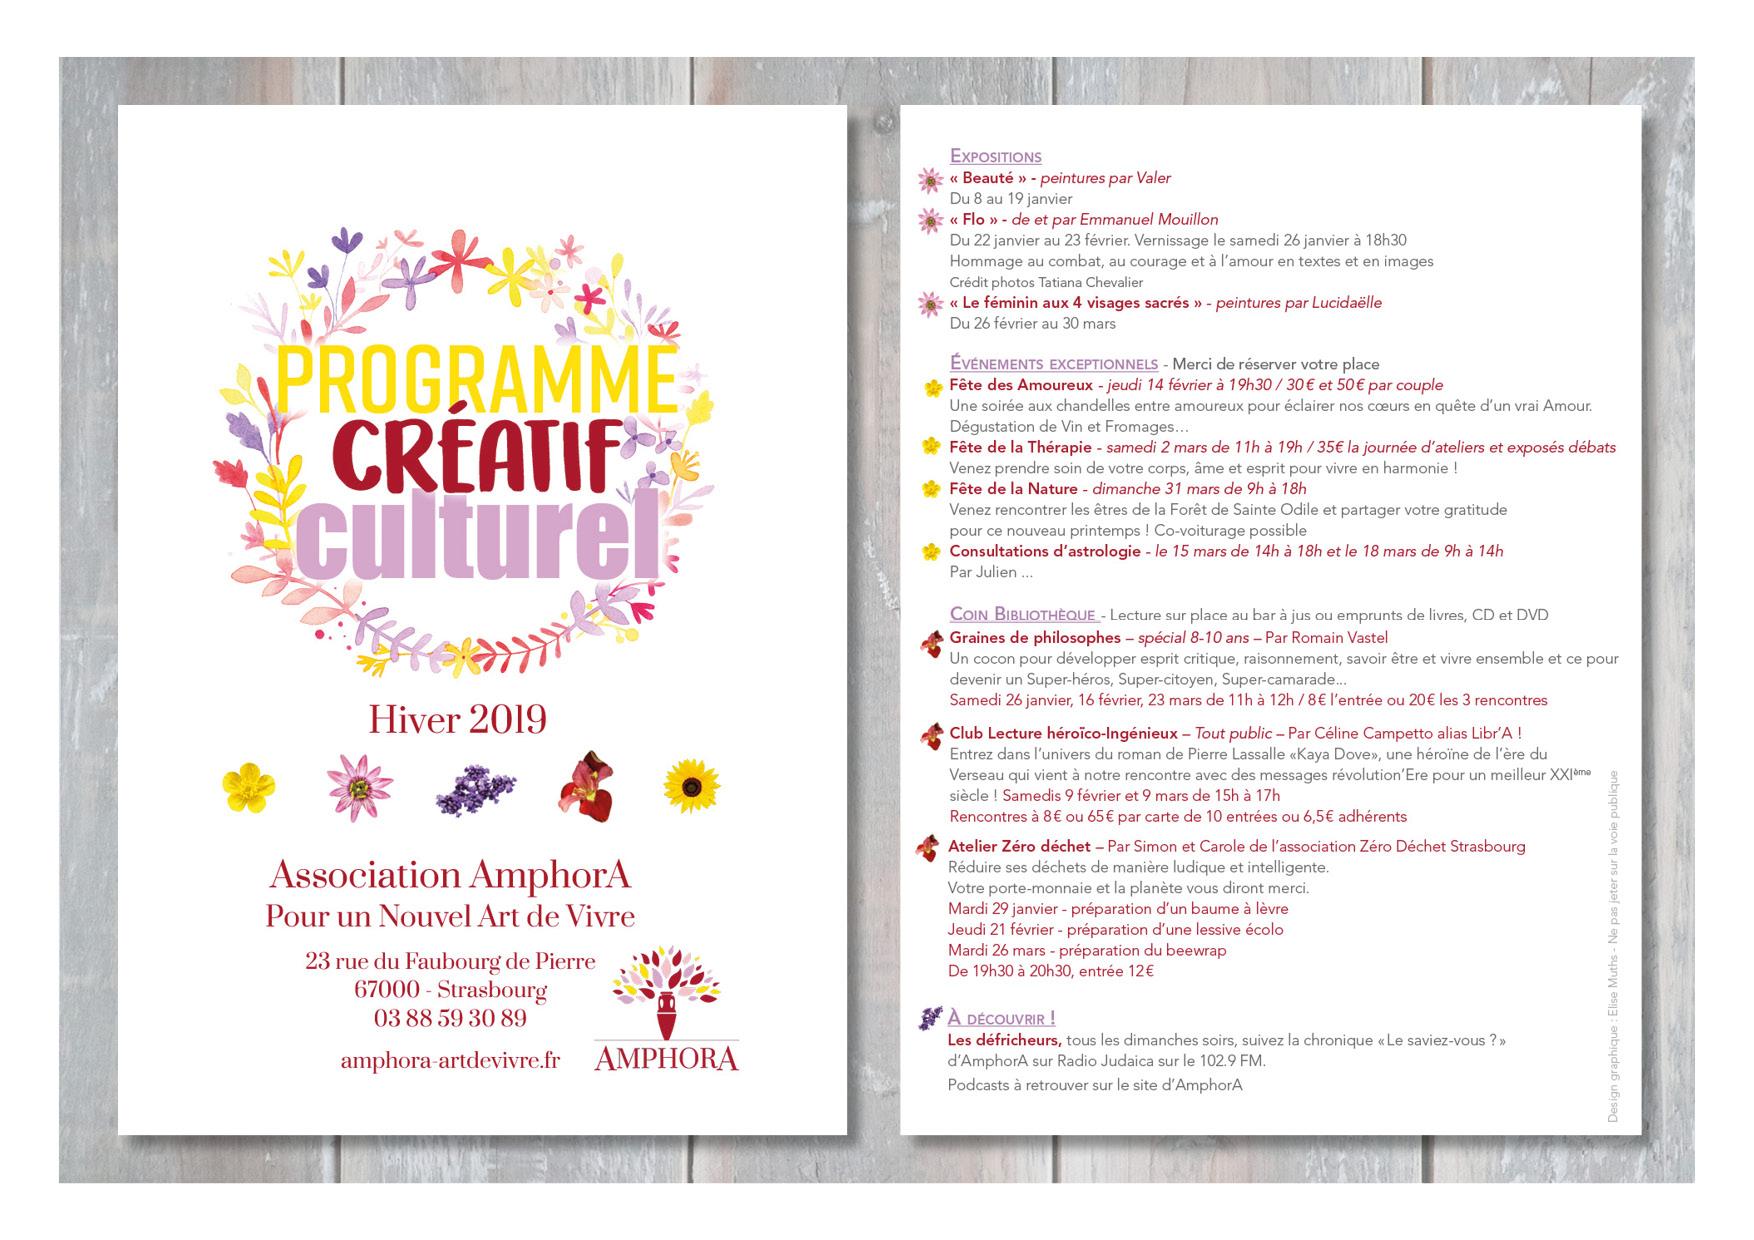 Programme créatif culturel / Association Amphora